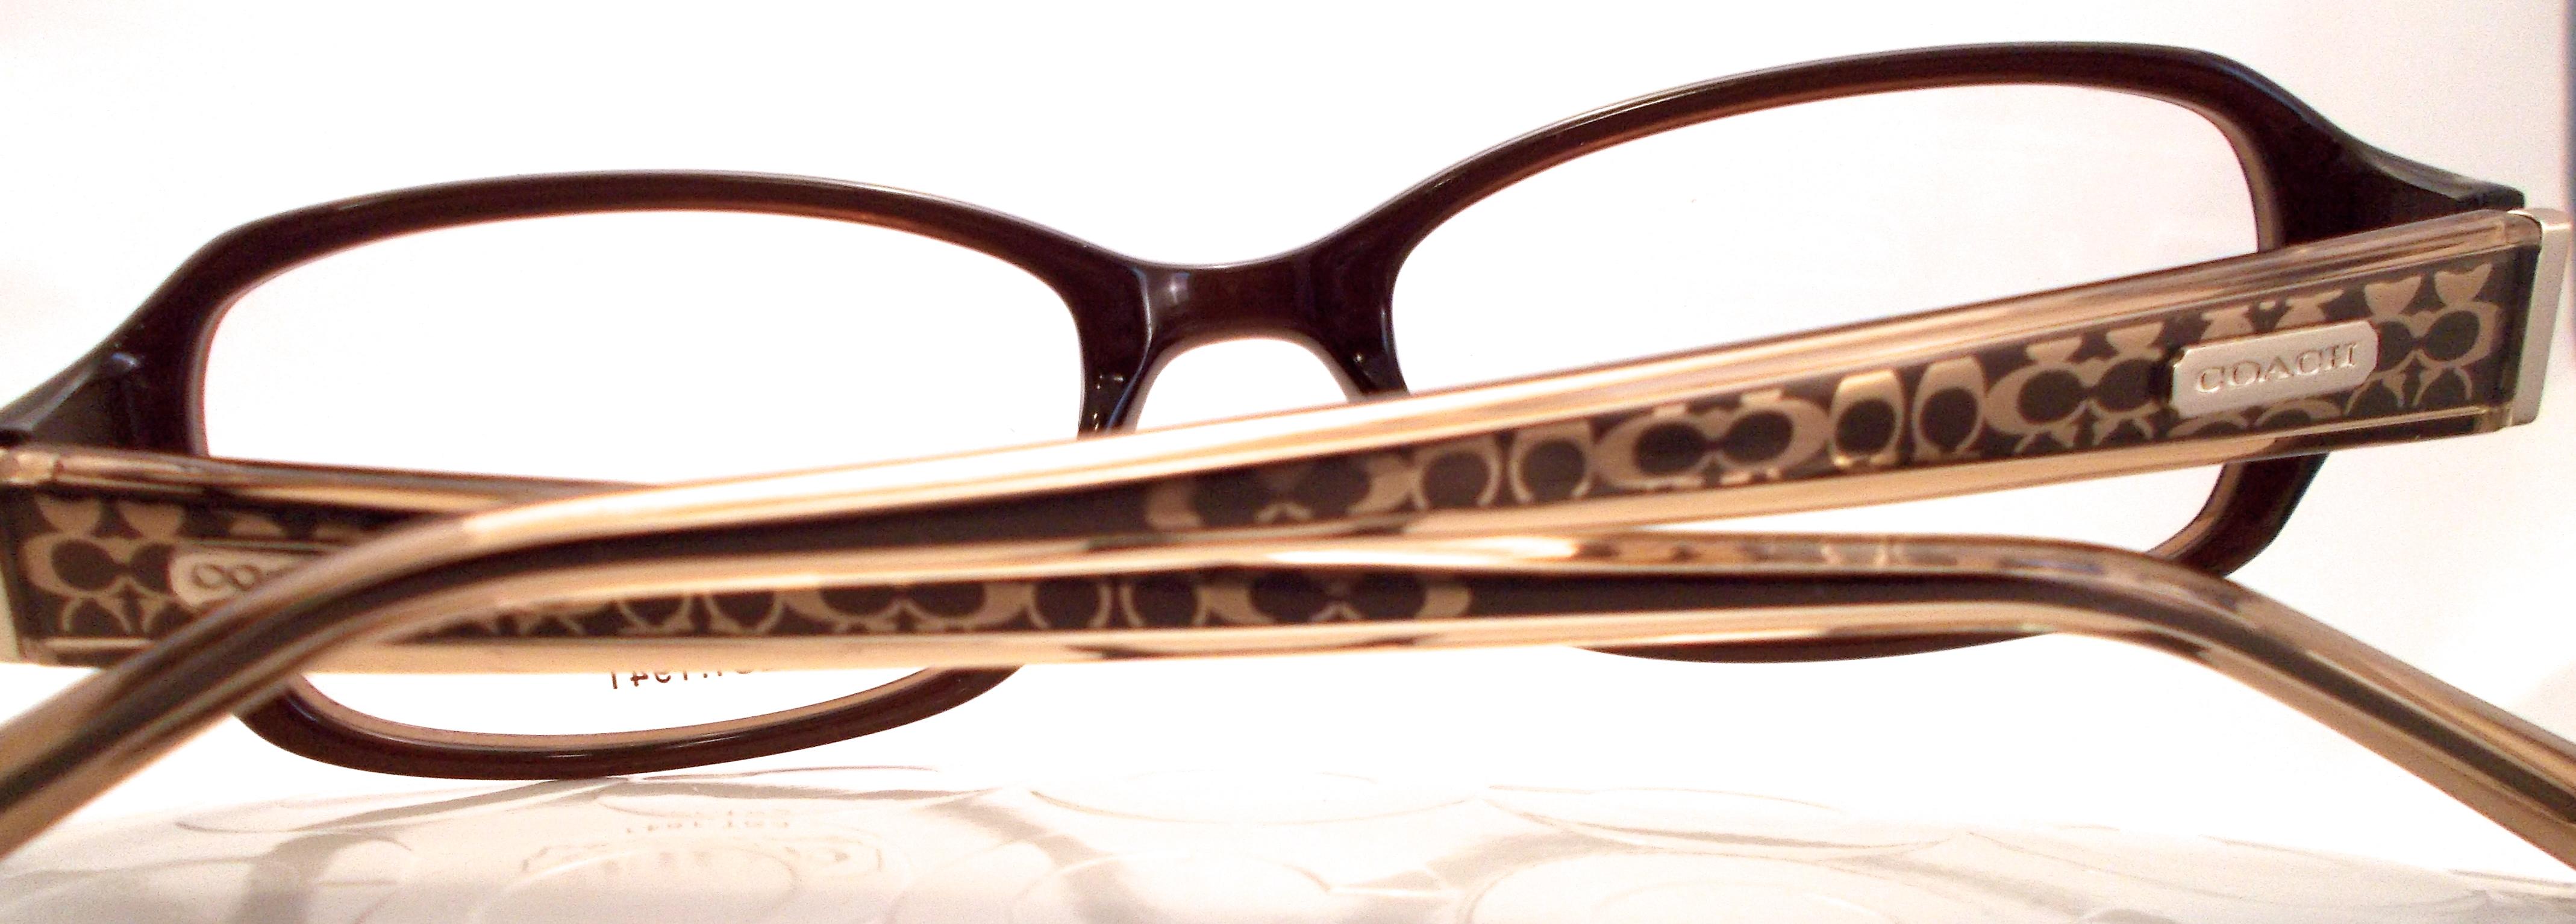 H&S Optical | Coach Midori 2036 Eyewear | Online Store Powered by ...